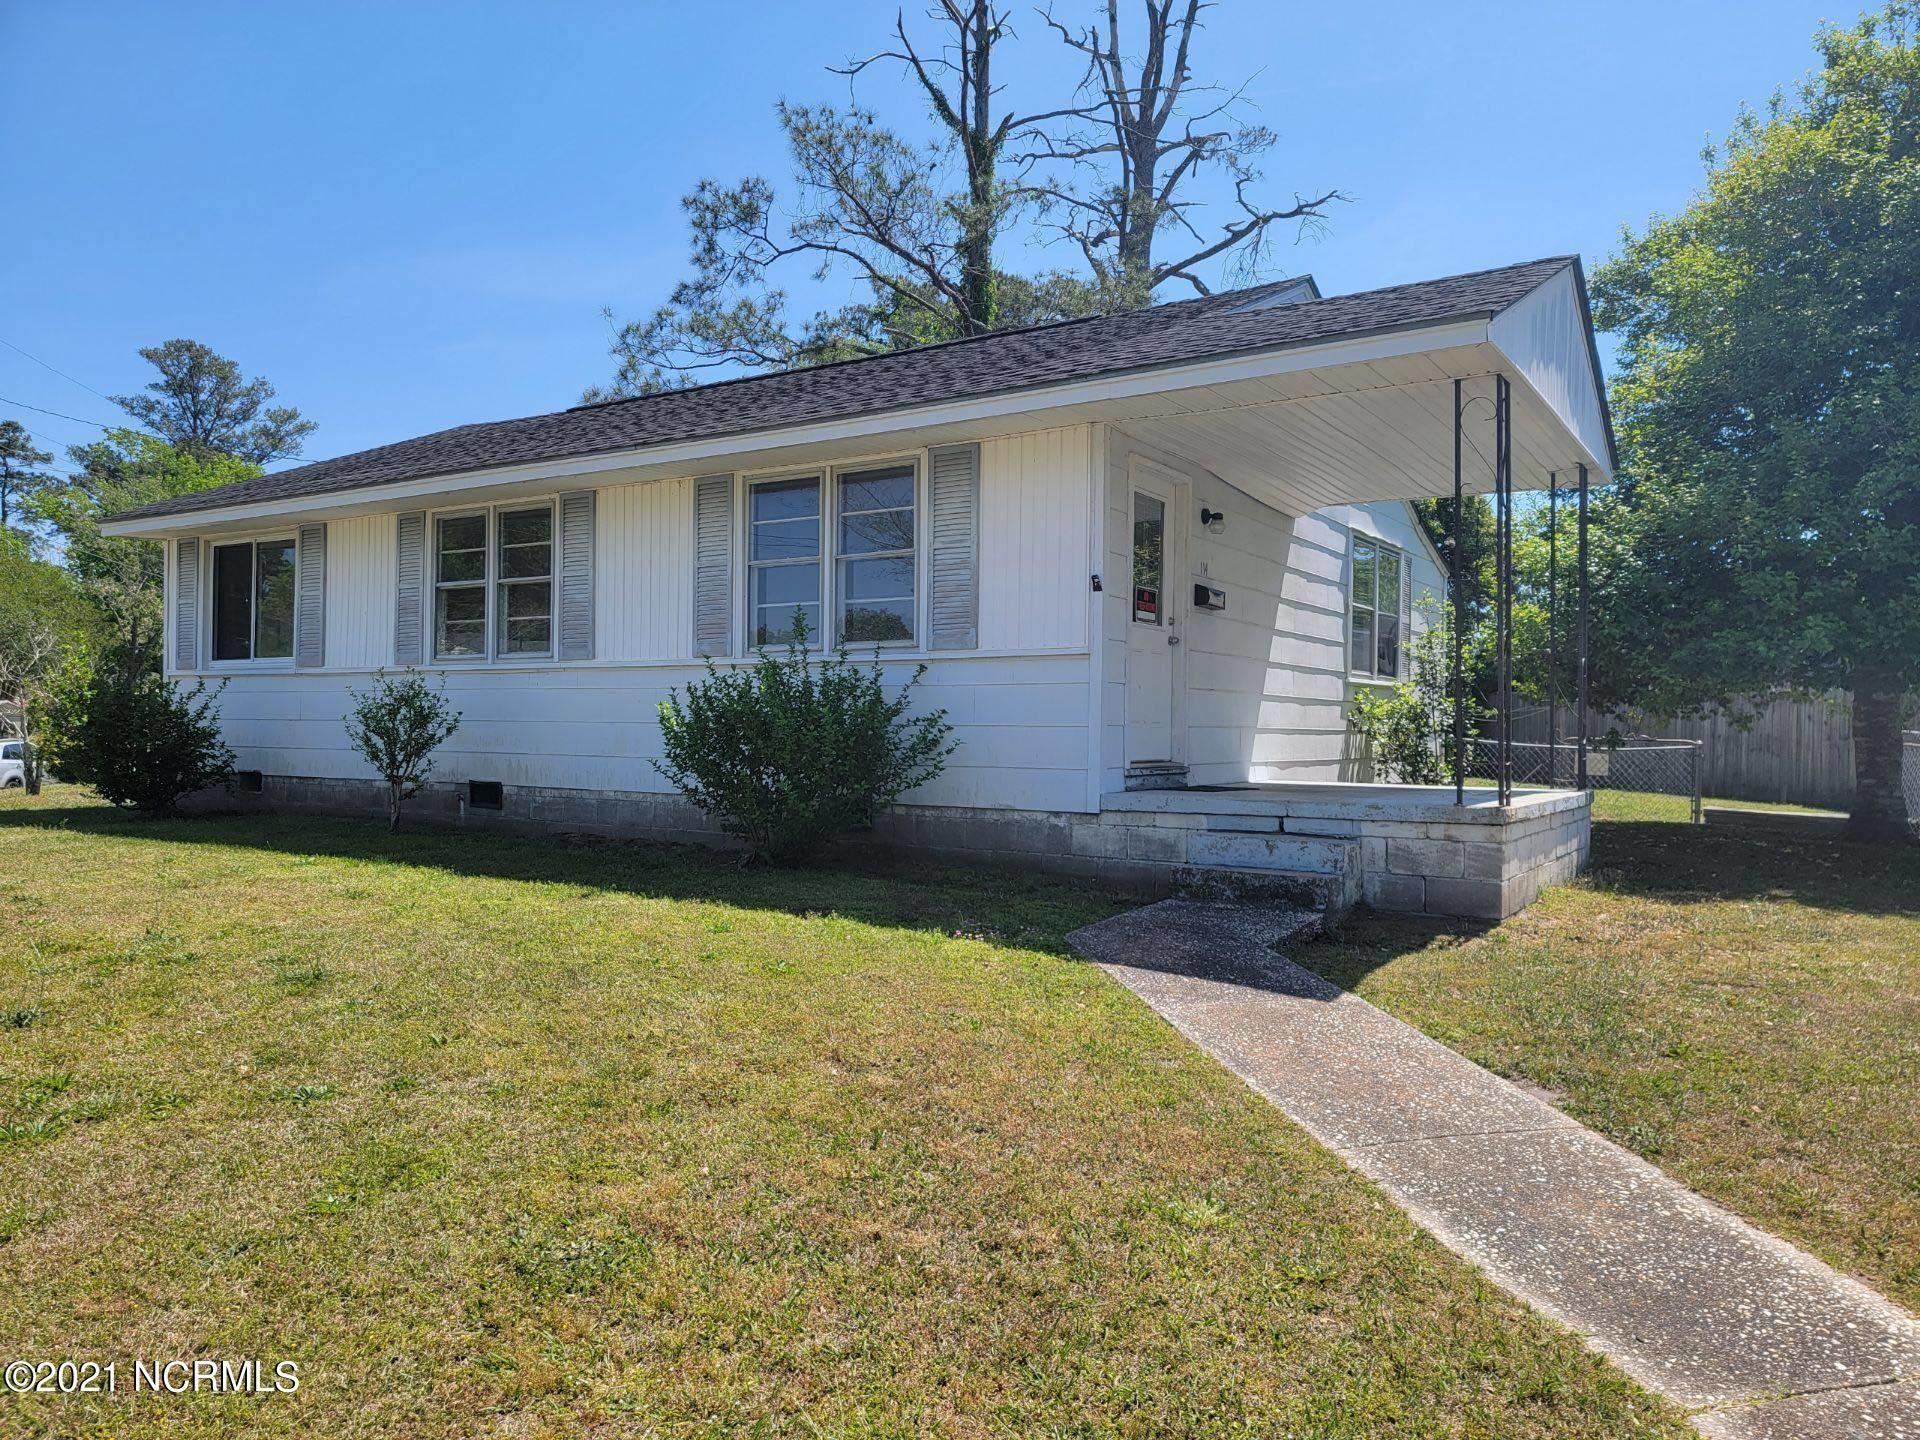 Photo of 114 Banks Street, Jacksonville, NC 28540 (MLS # 100269813)